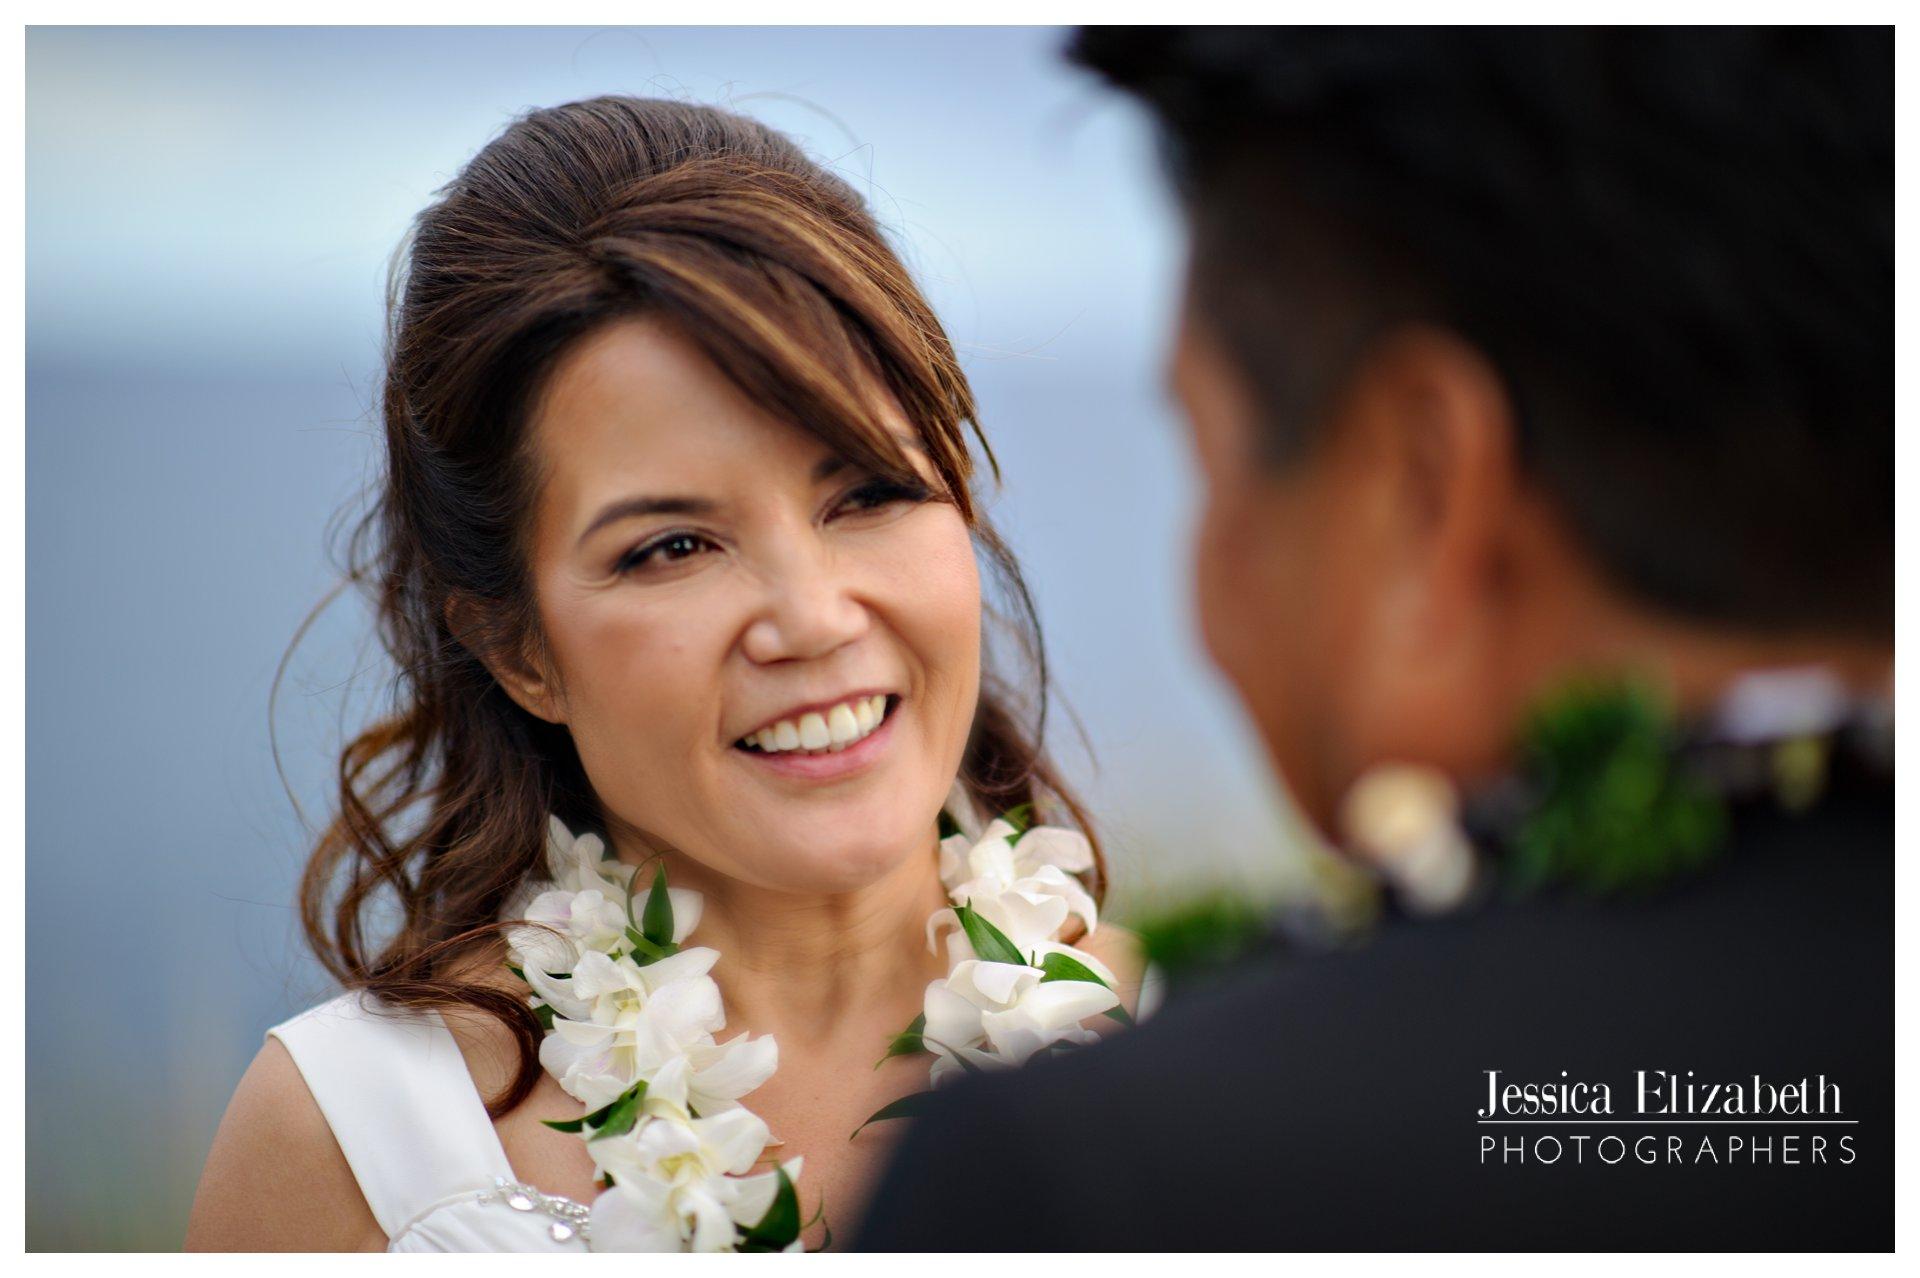 31-Terranea-Palos-Verdes-Wedding-Photography-by-Jessica-Elizabeth-w.jpg